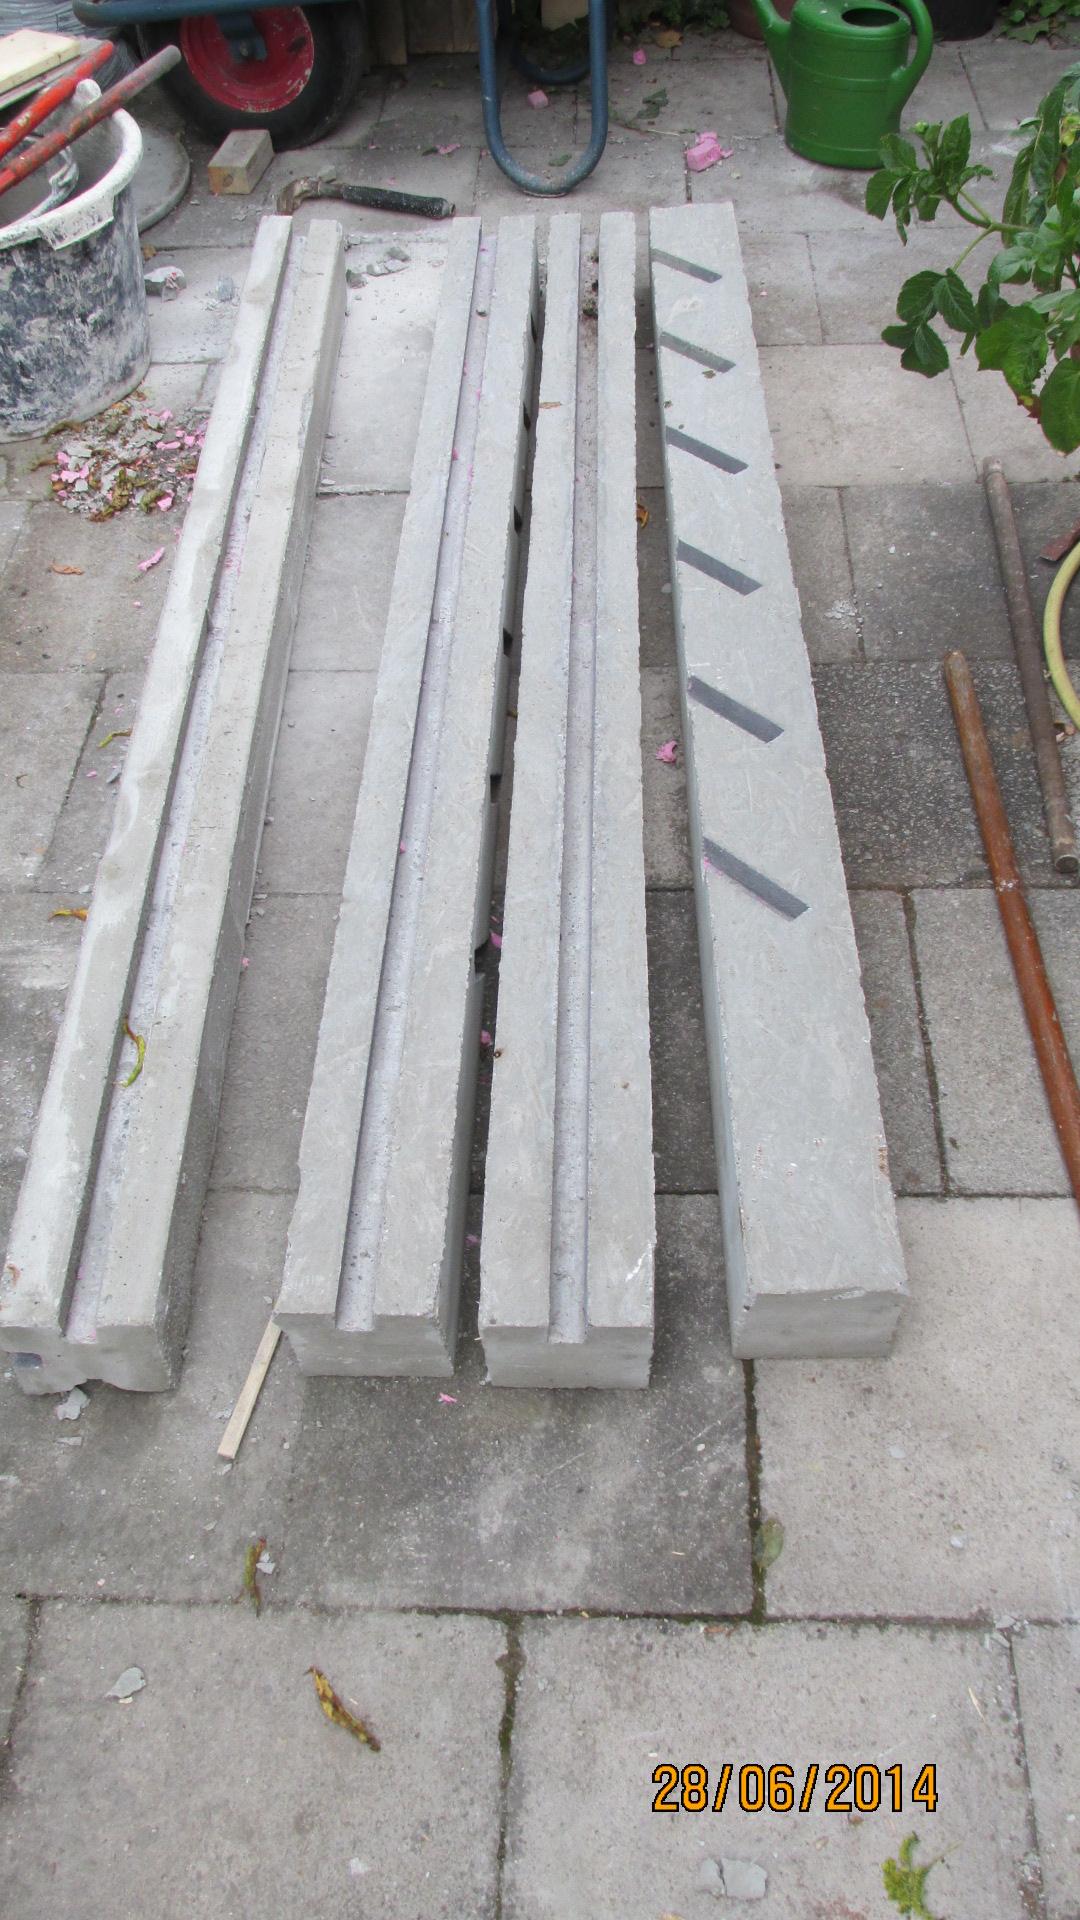 komposter aus beton gartenplanung gartengestaltung green24 hilfe pflege bilder. Black Bedroom Furniture Sets. Home Design Ideas